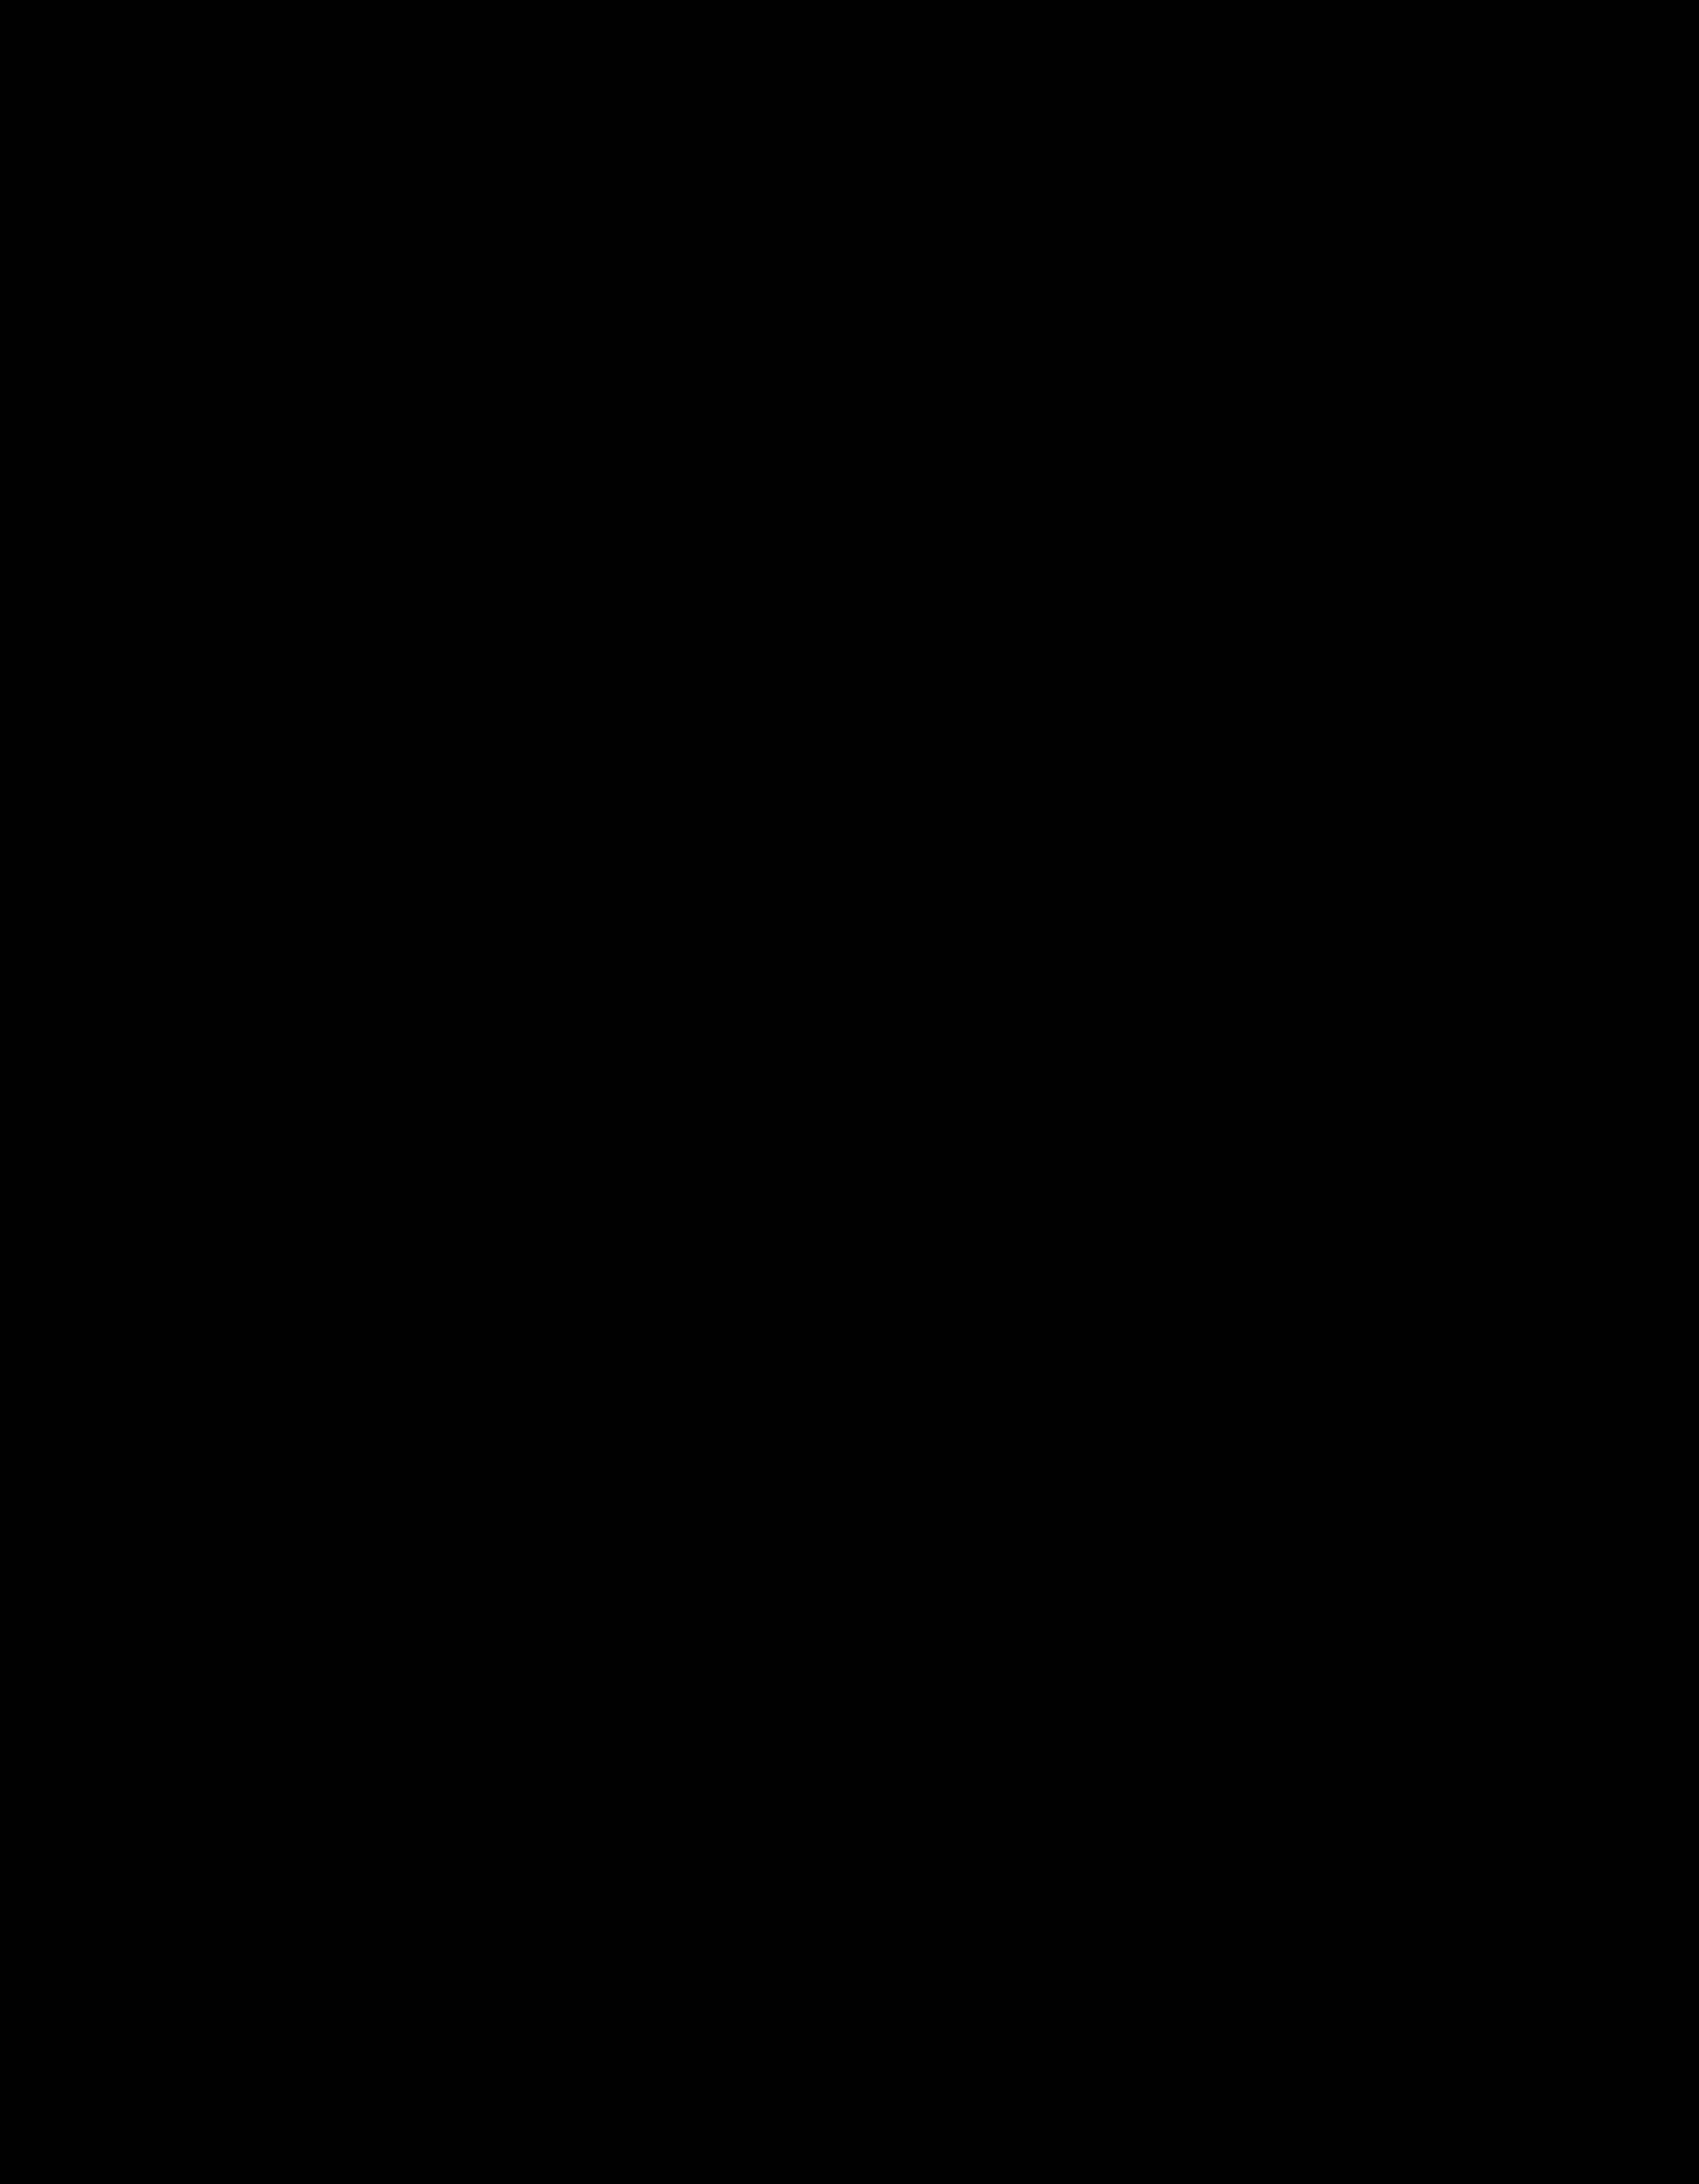 Kkk PNG - 43399